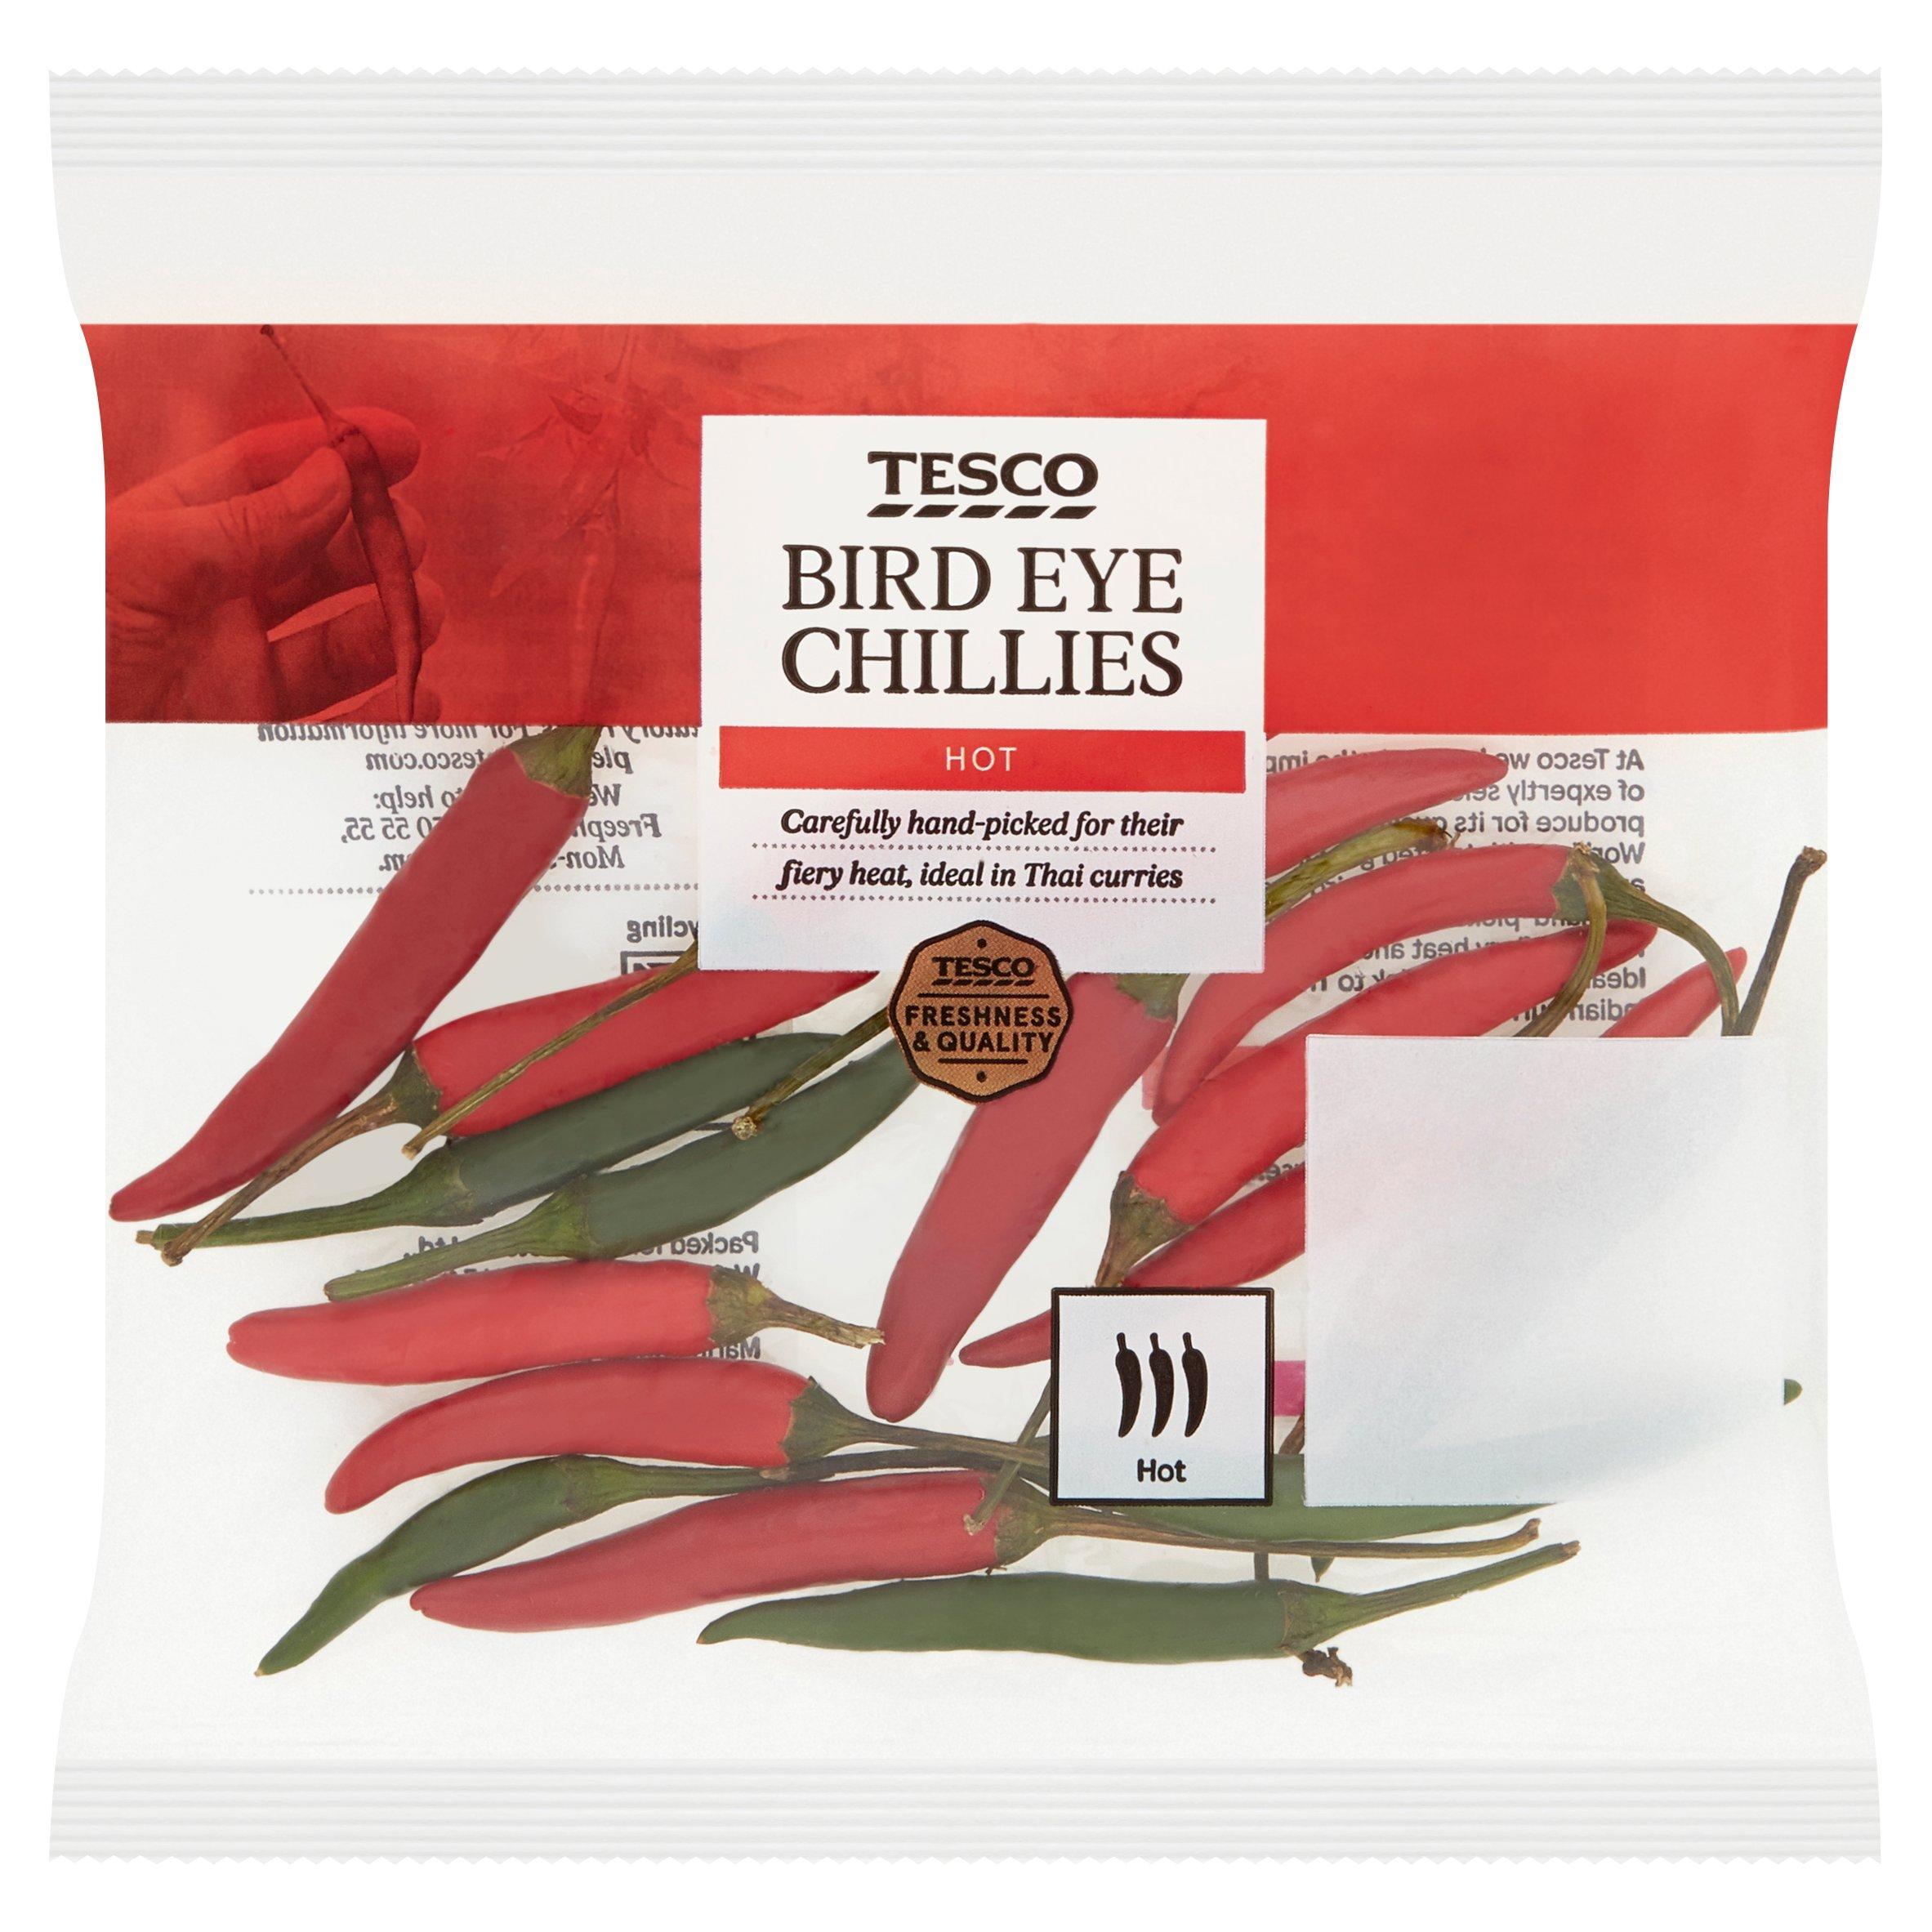 Tesco Bird Eye Chillies 25G Price Marked